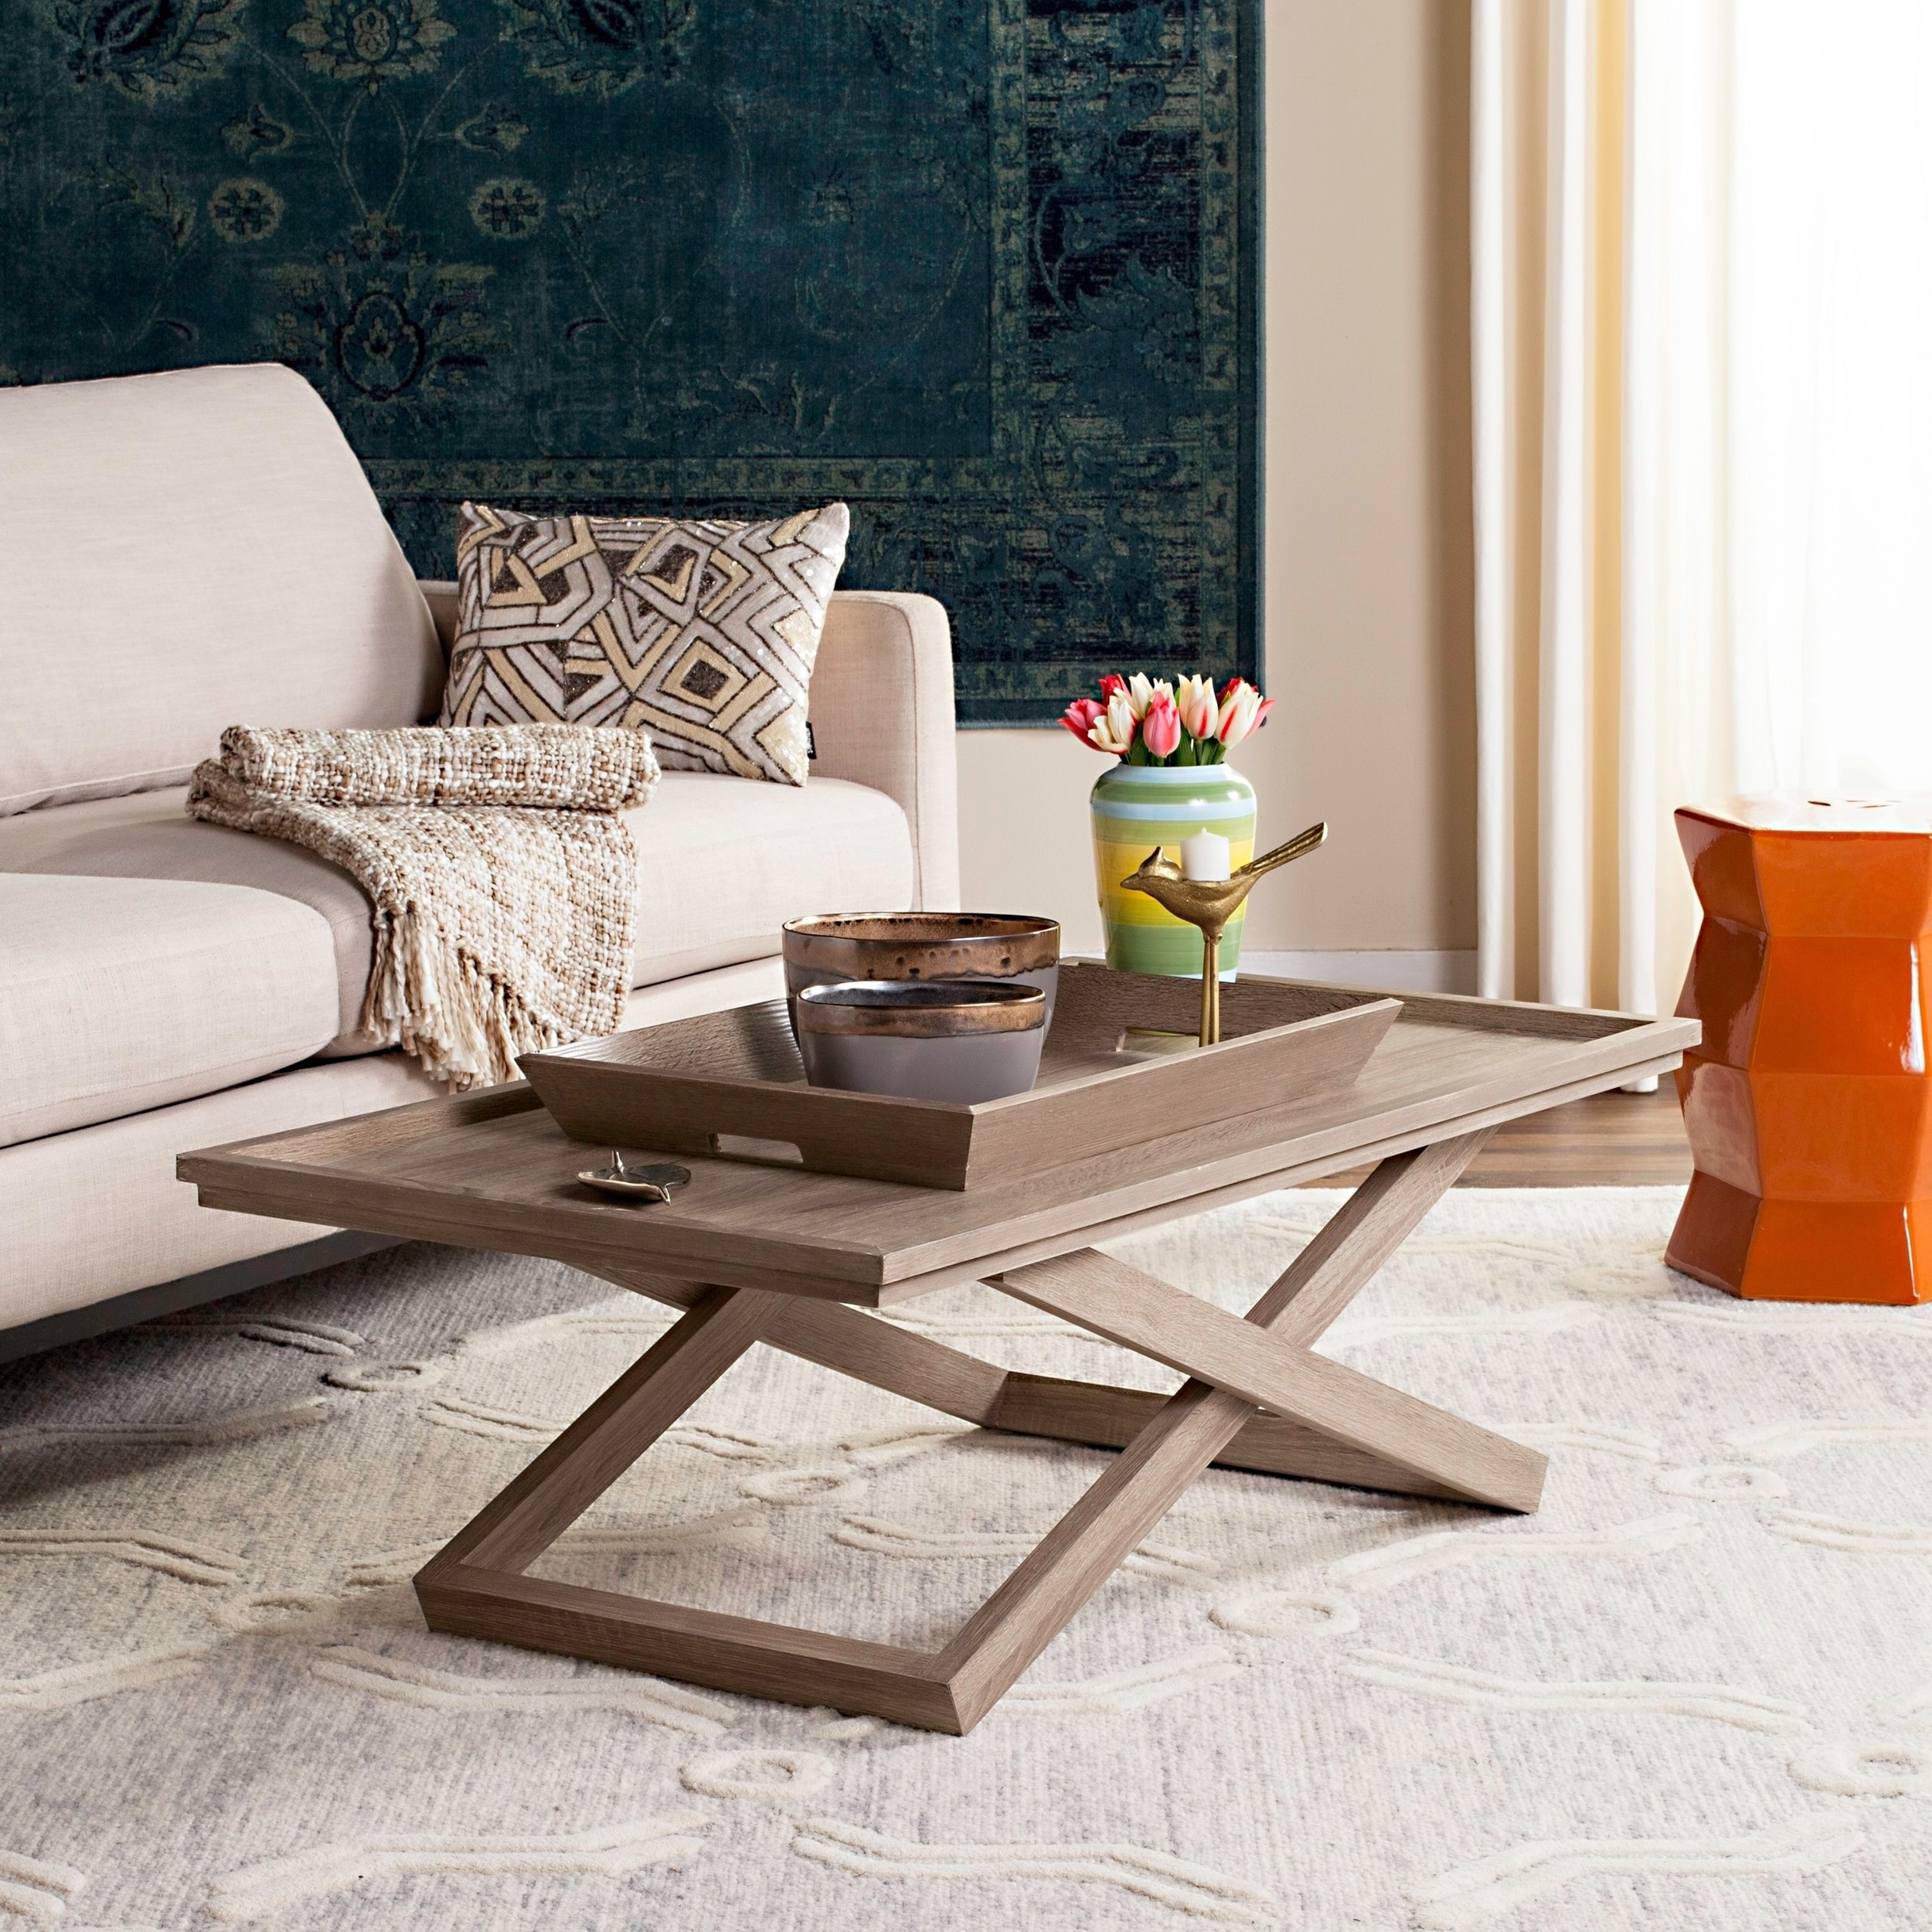 Safavieh Arleana Cross Leg Coffee Table Tray 43 3 X 23 6 X 14 5 Overstock 13339544